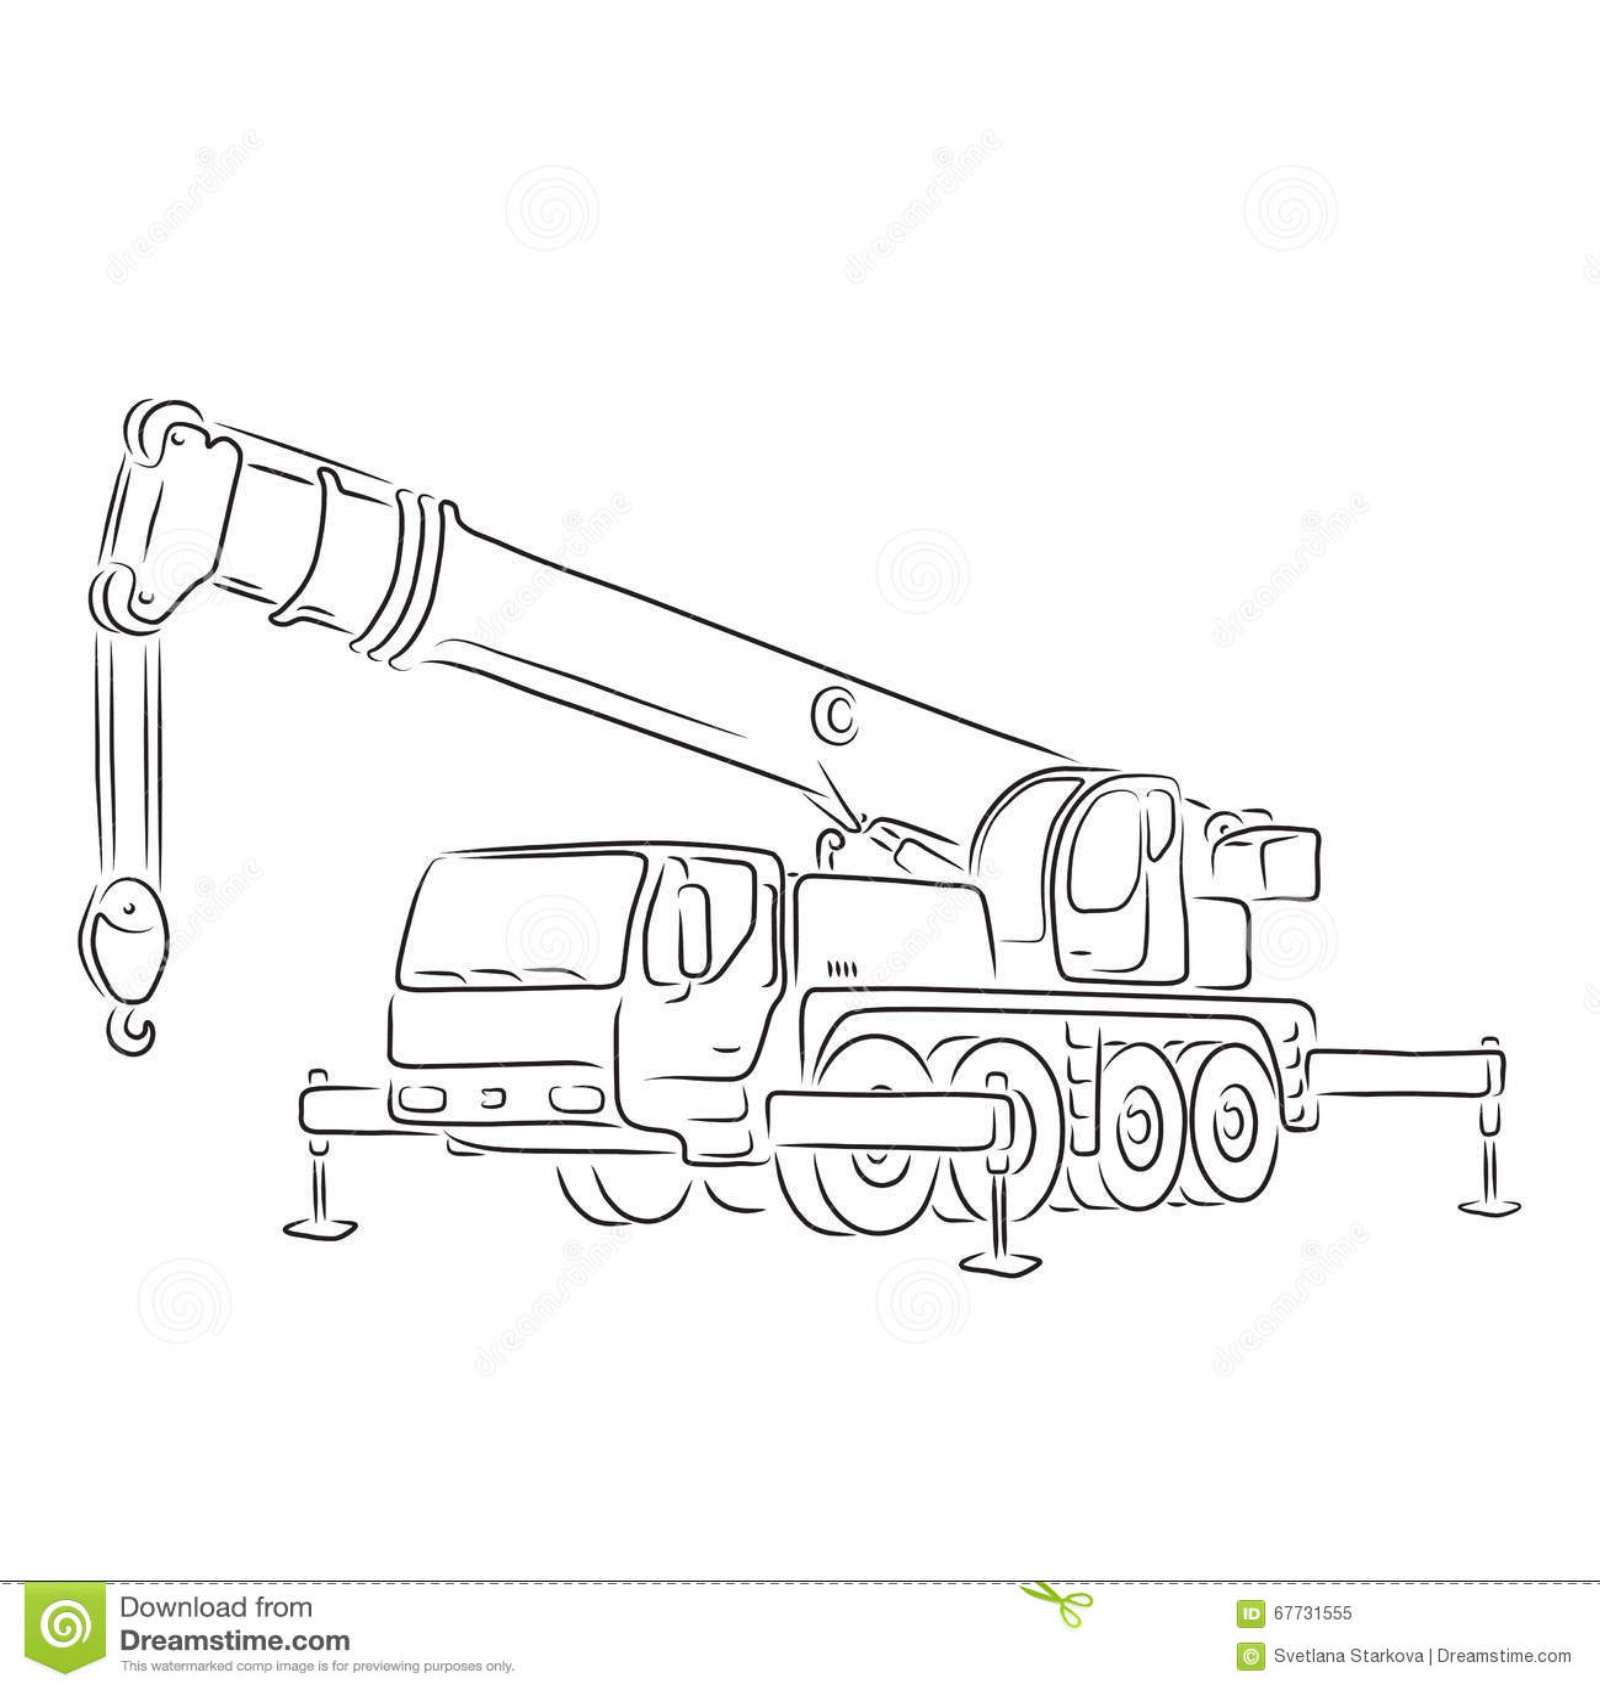 Outline Of Truck Mounted Crane Vector Illustration Stock